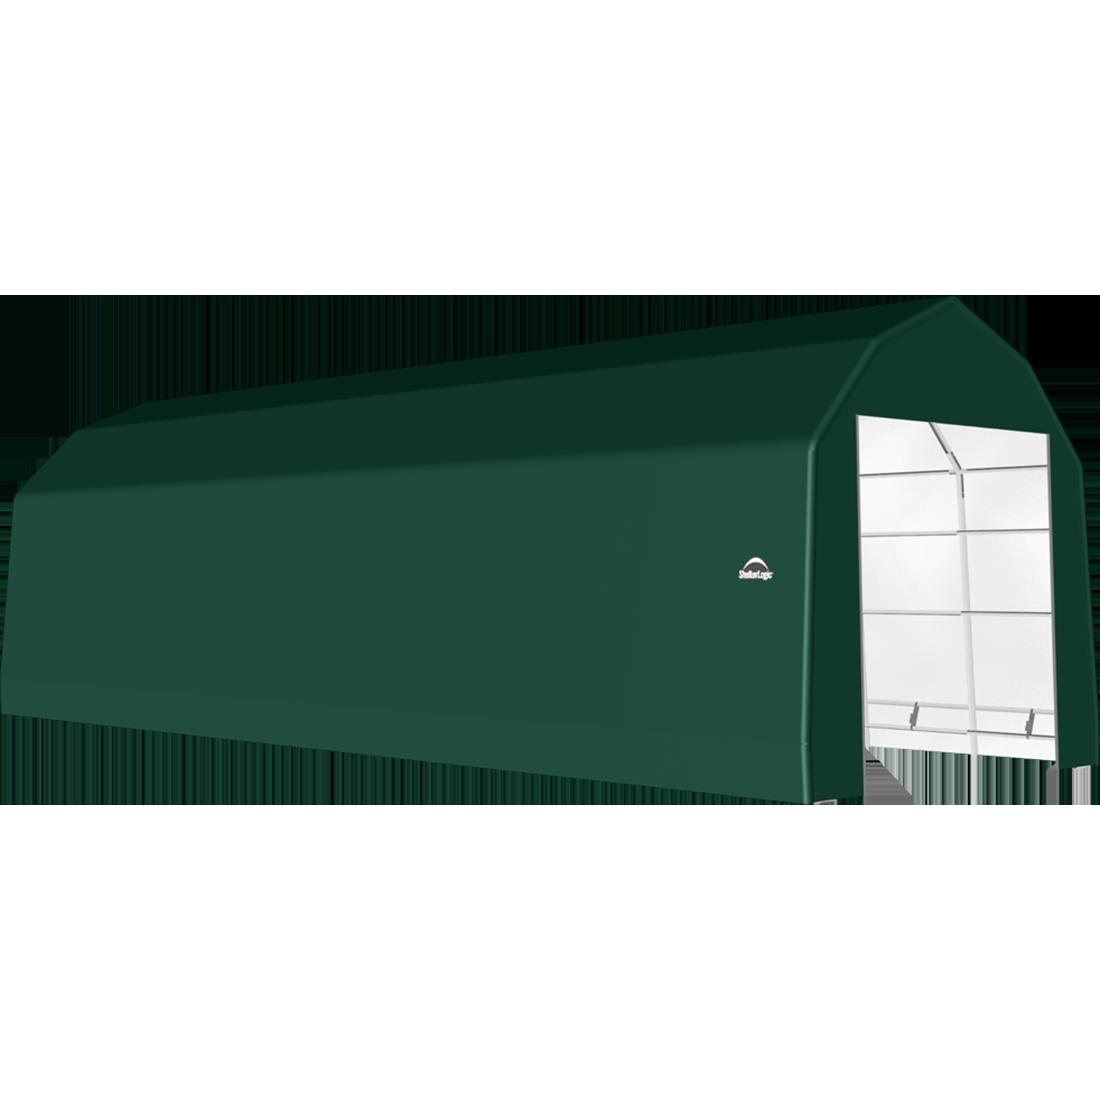 ShelterTech SP Series Barn Shelter, 15 ft. x 32 ft. x 14 ft. Heavy Duty PVC 14.5 oz. Green